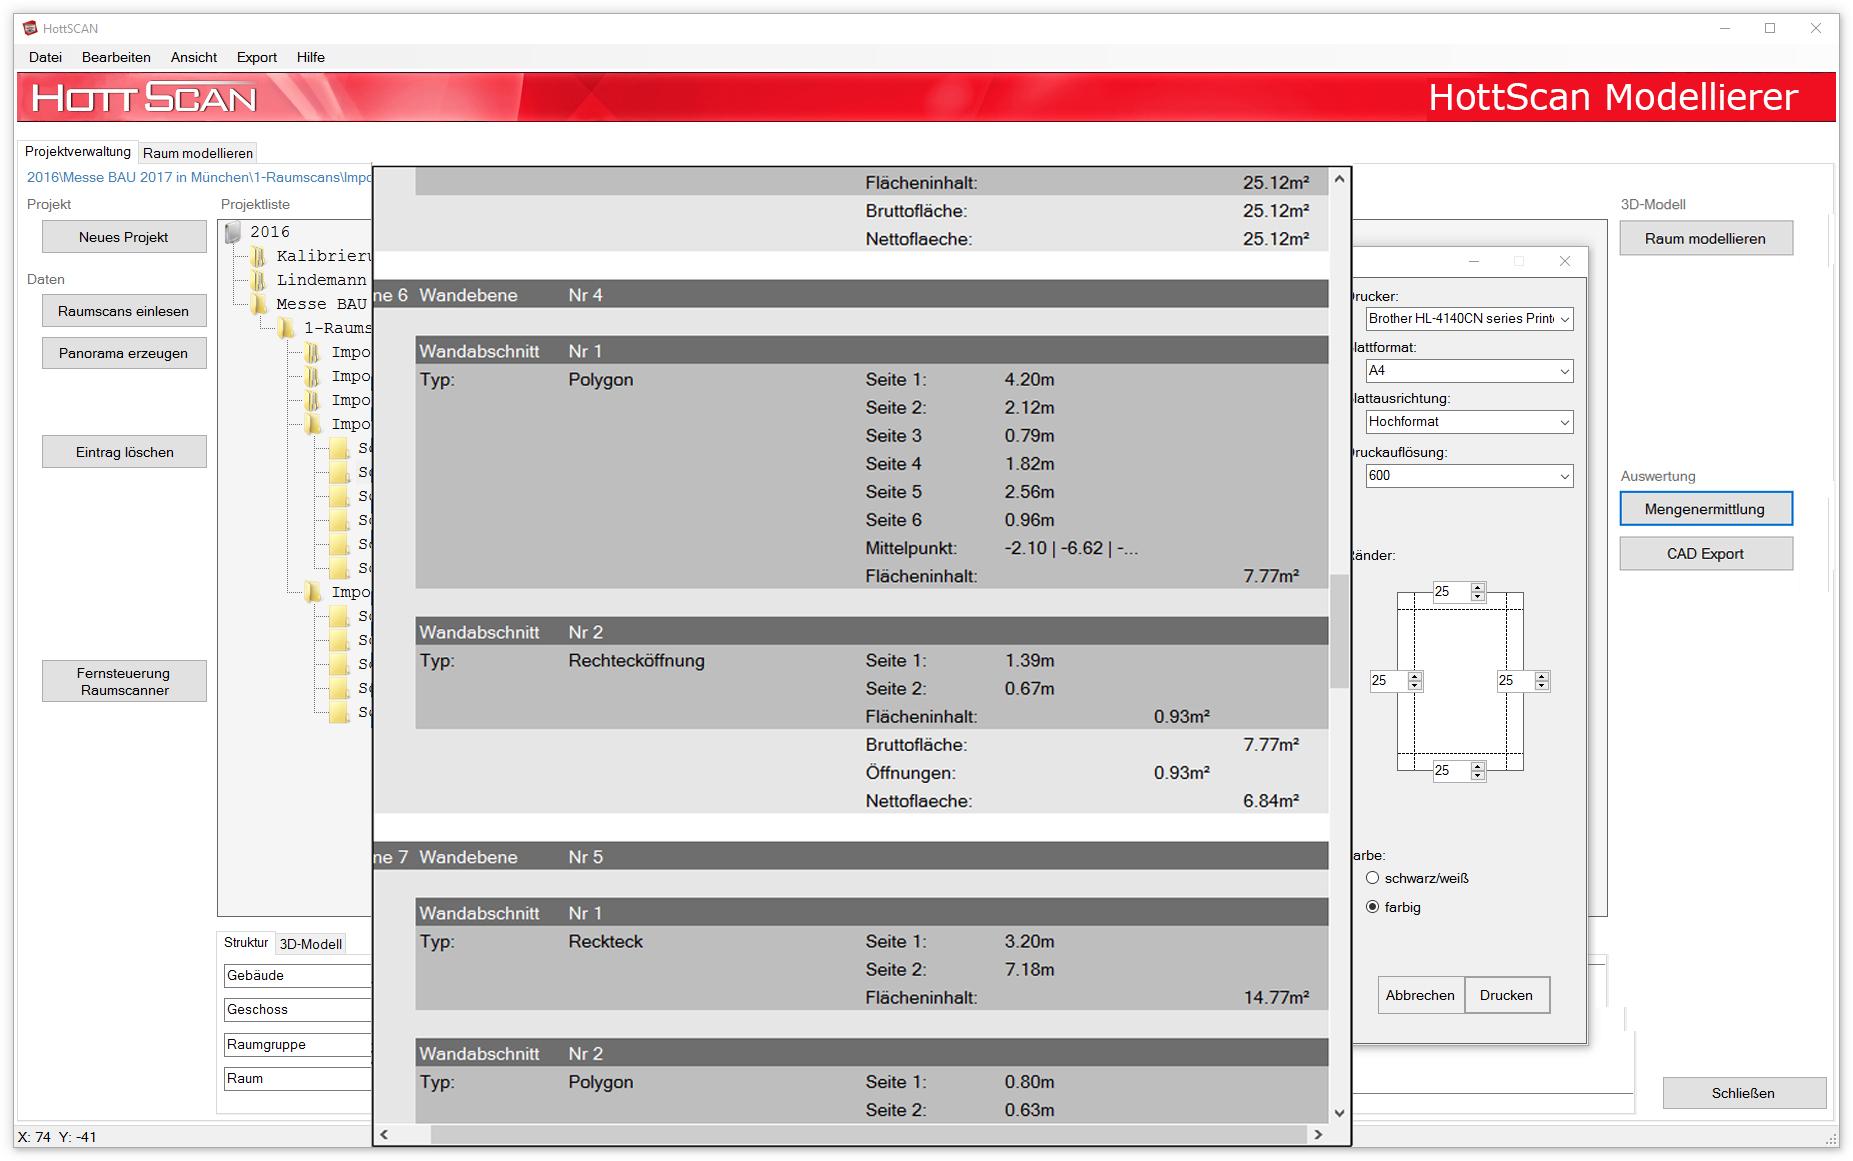 HottScan Modelling Software